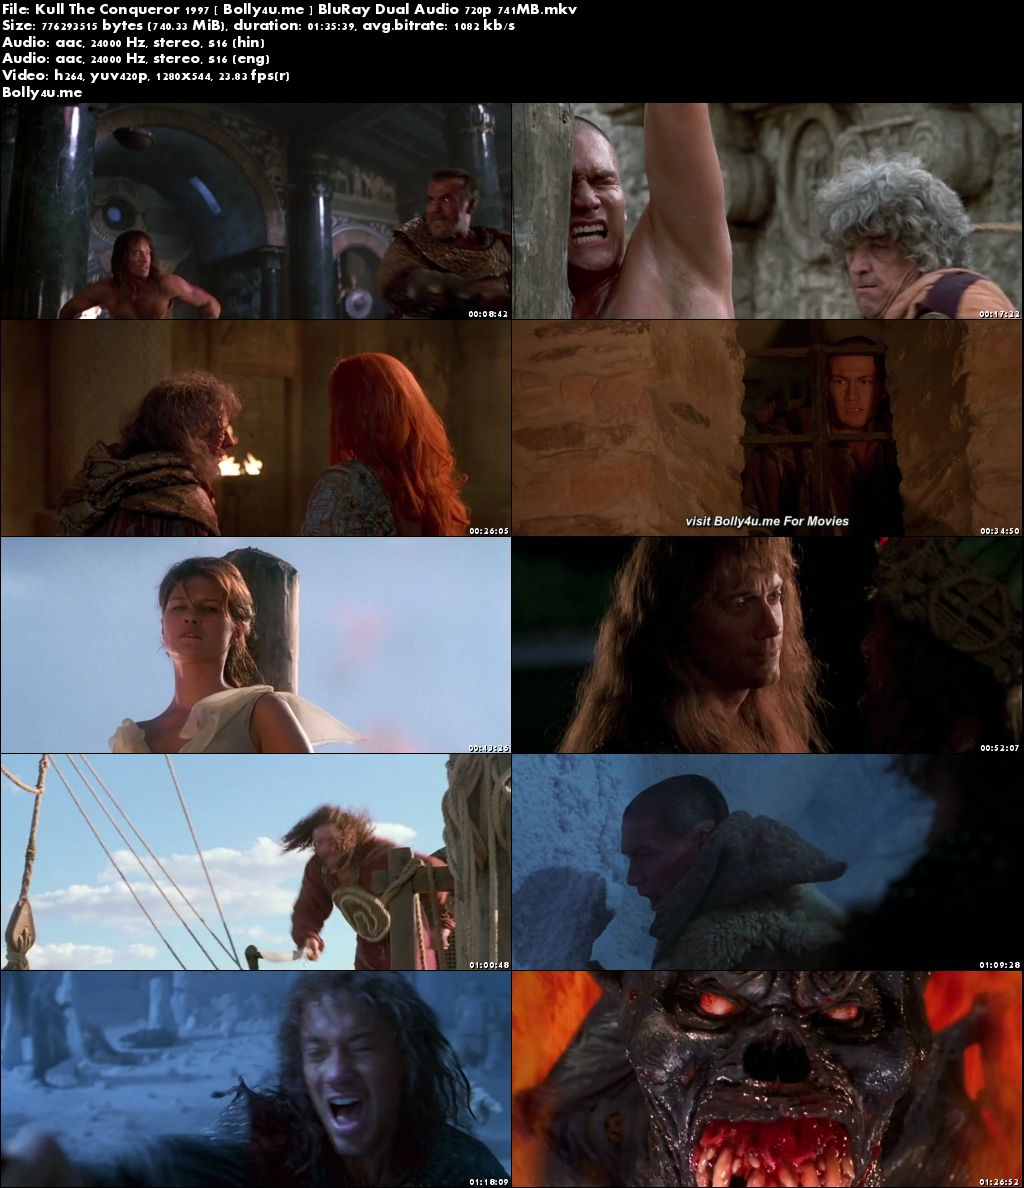 Kull The Conqueror 1997 BluRay 300MB Hindi Dual Audio 480p Download